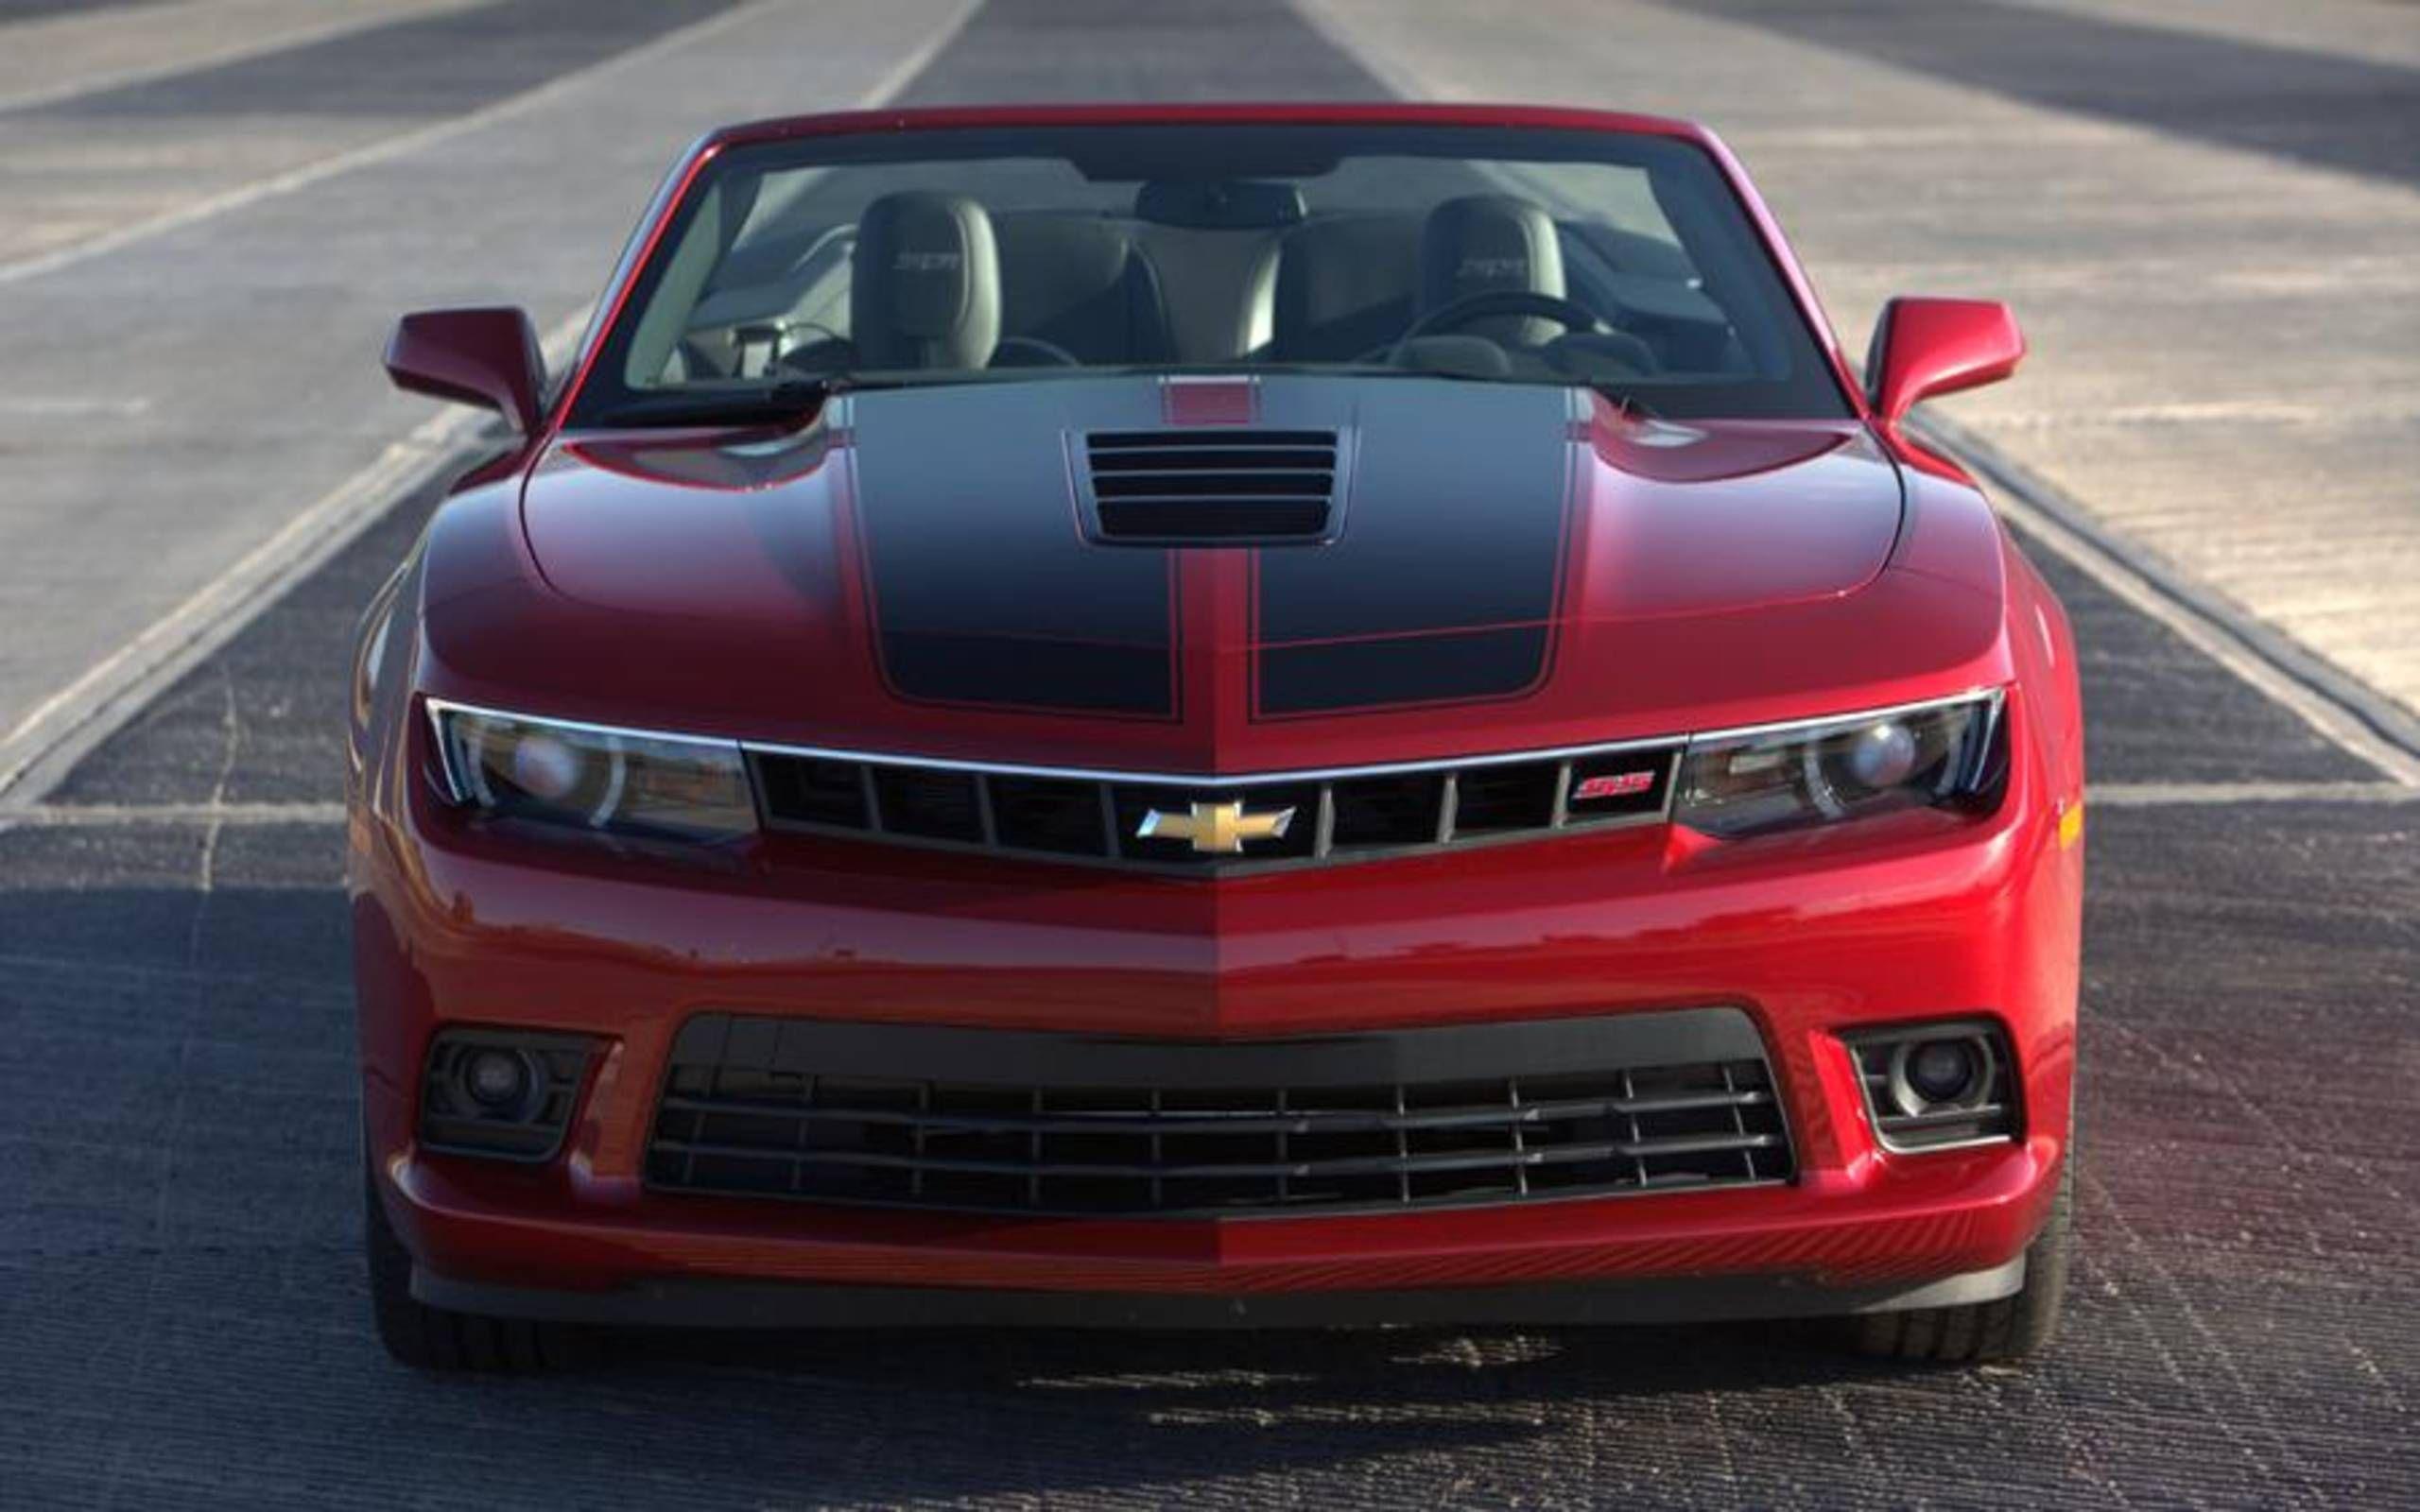 2014 Chevrolet Camaro 2ss Convertible Review Notes